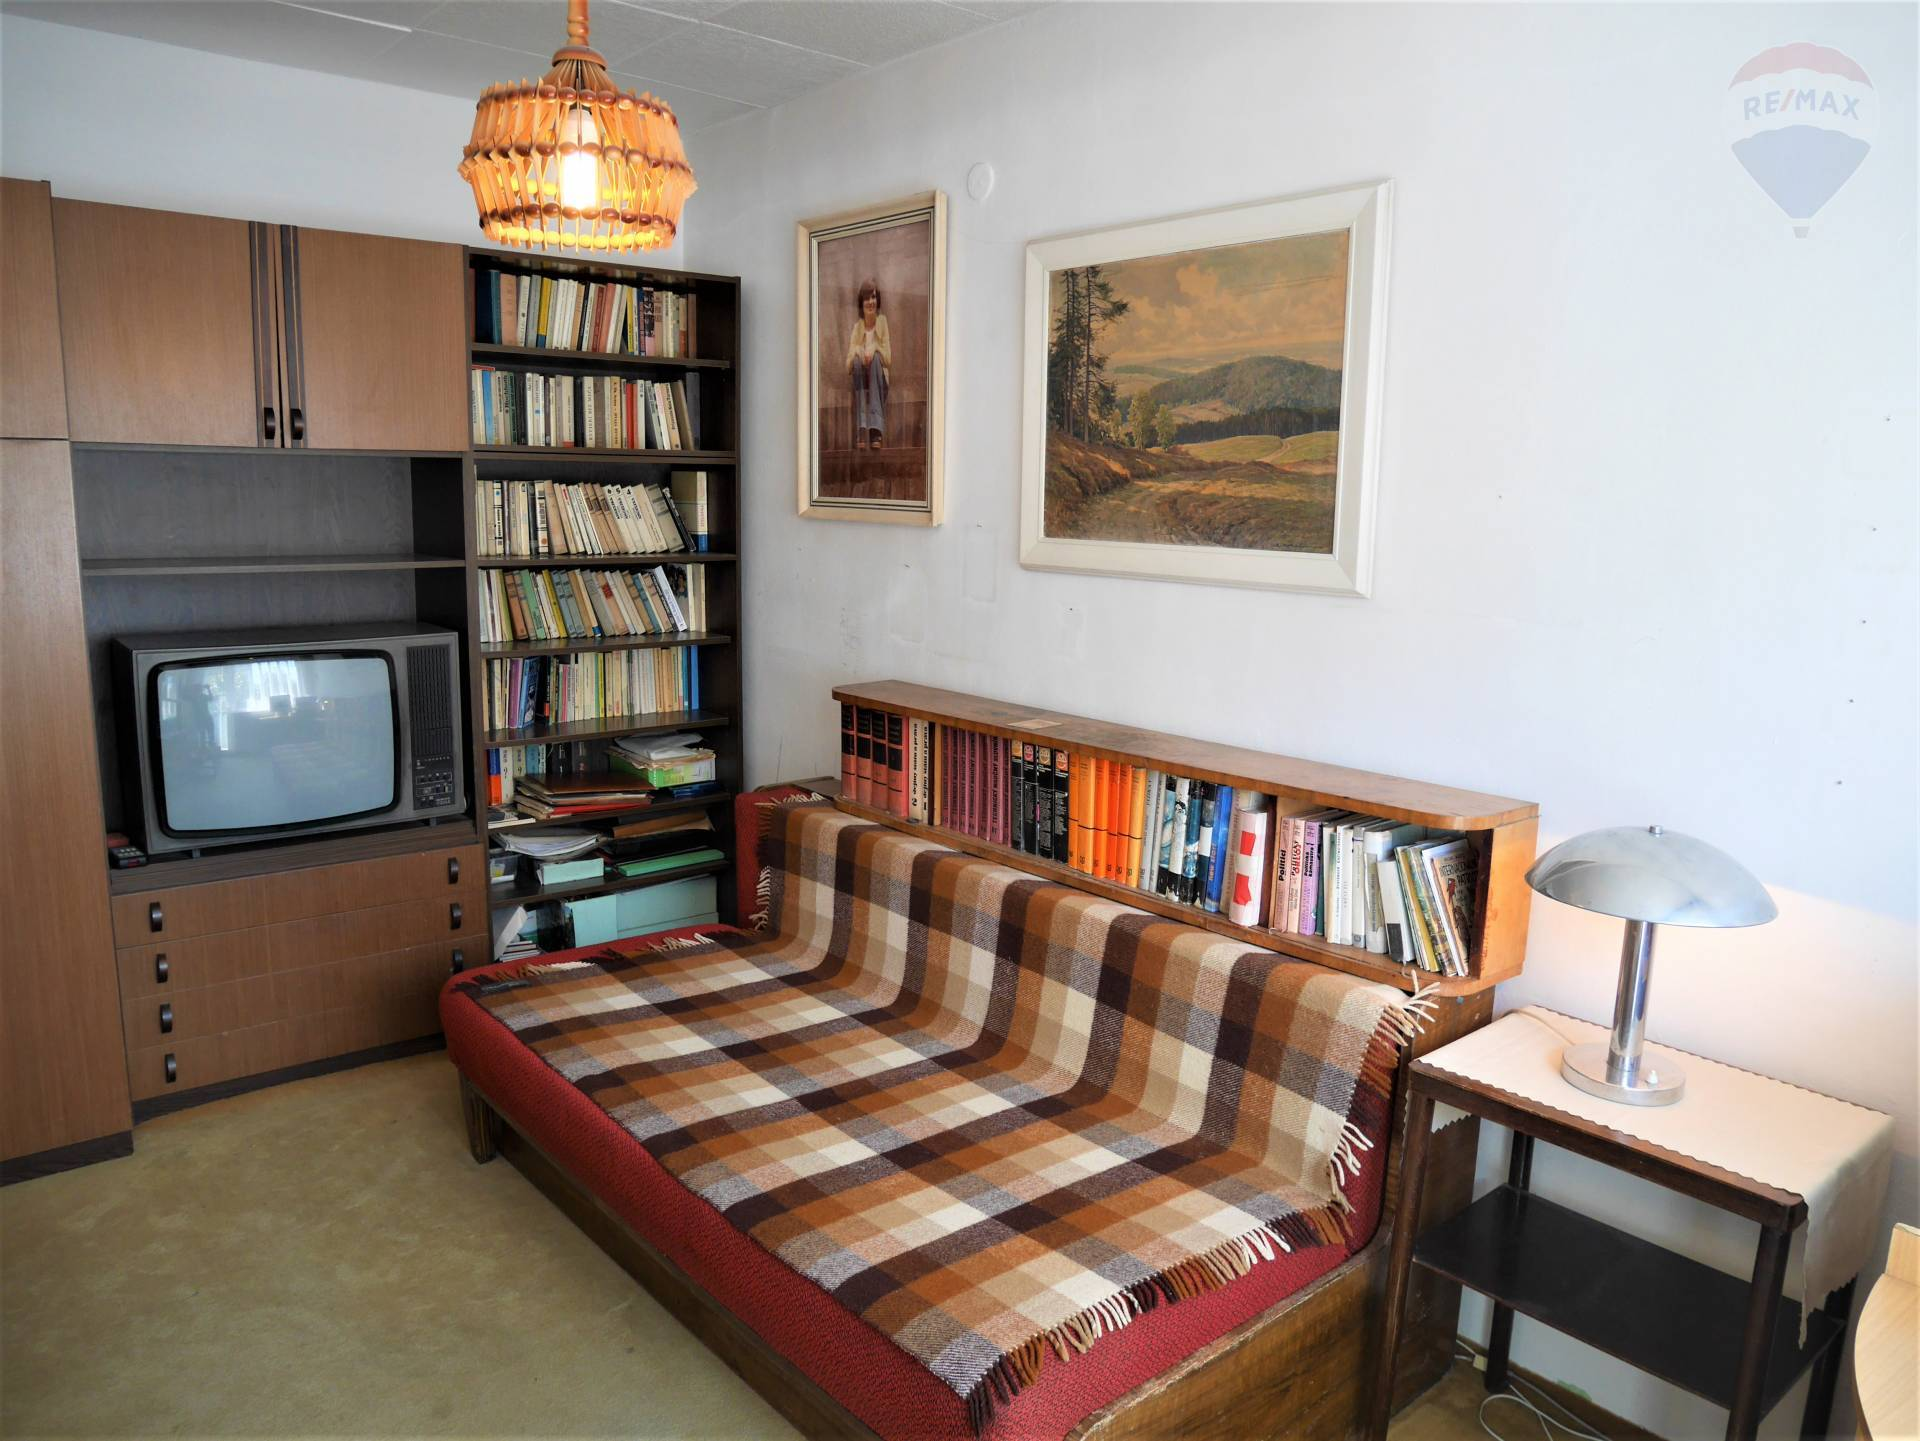 PREDAJ 3-izb bytu ul. Bjornsona - Staré sídlisko - Prievidza